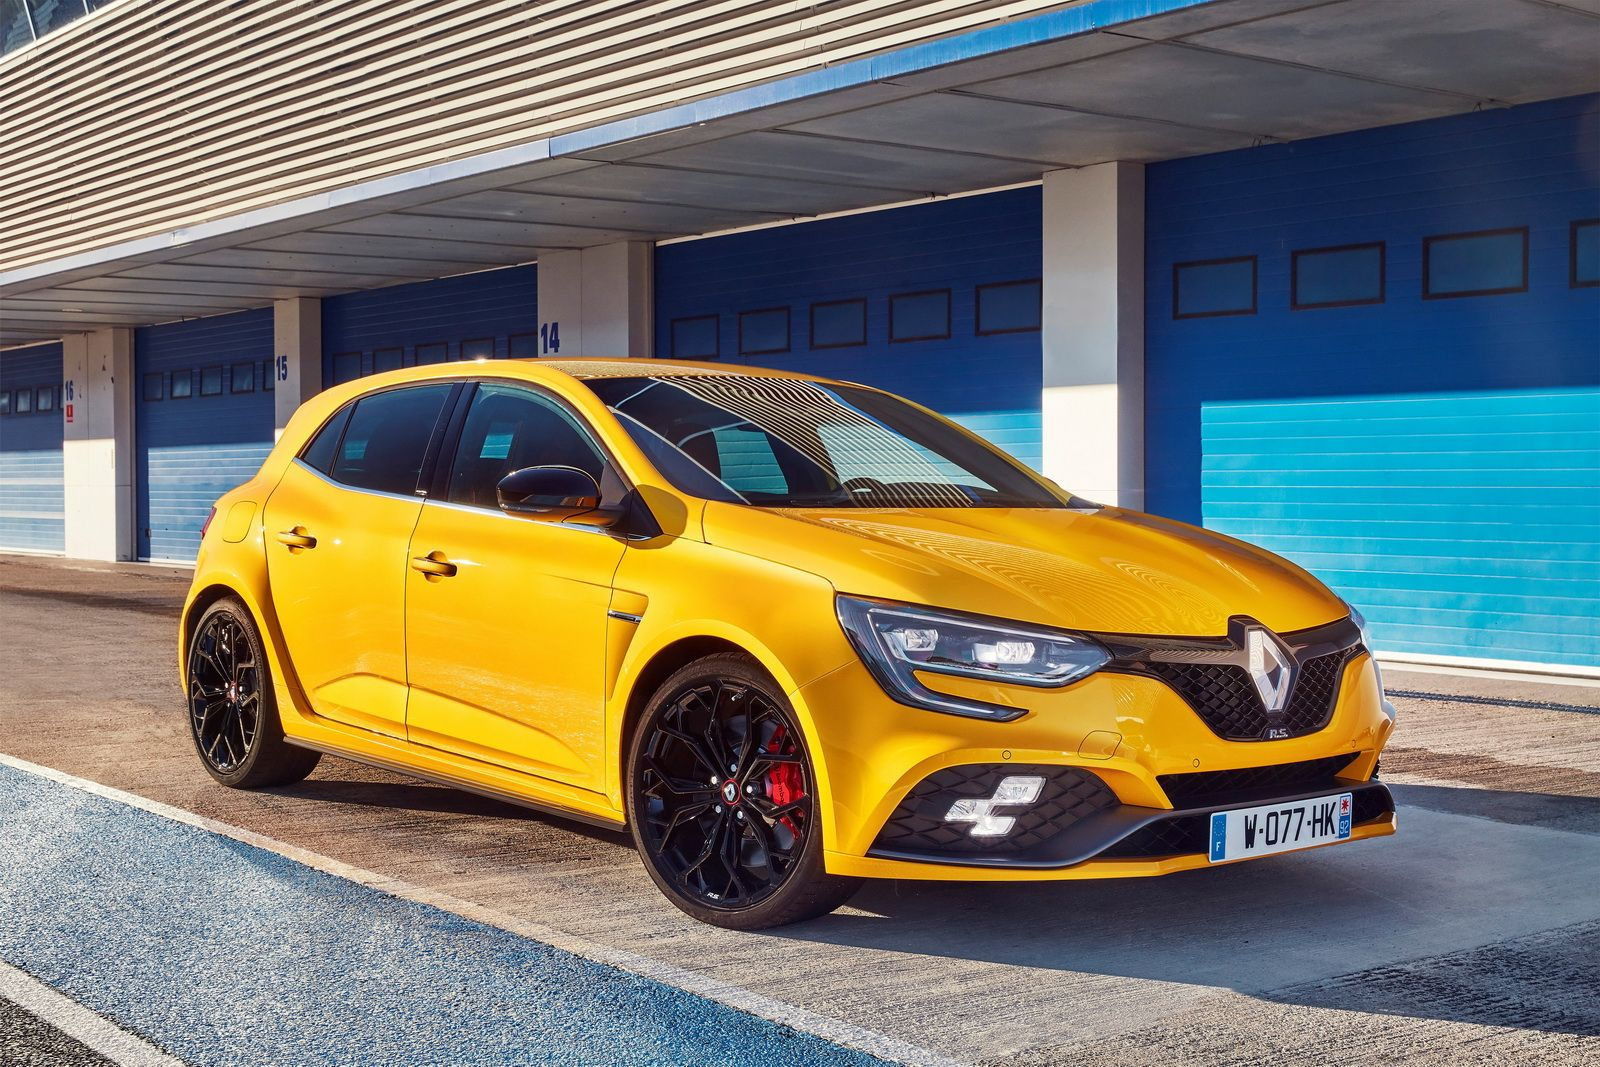 New Renault Megane Rs Detailed In 132 Images New Renault Black